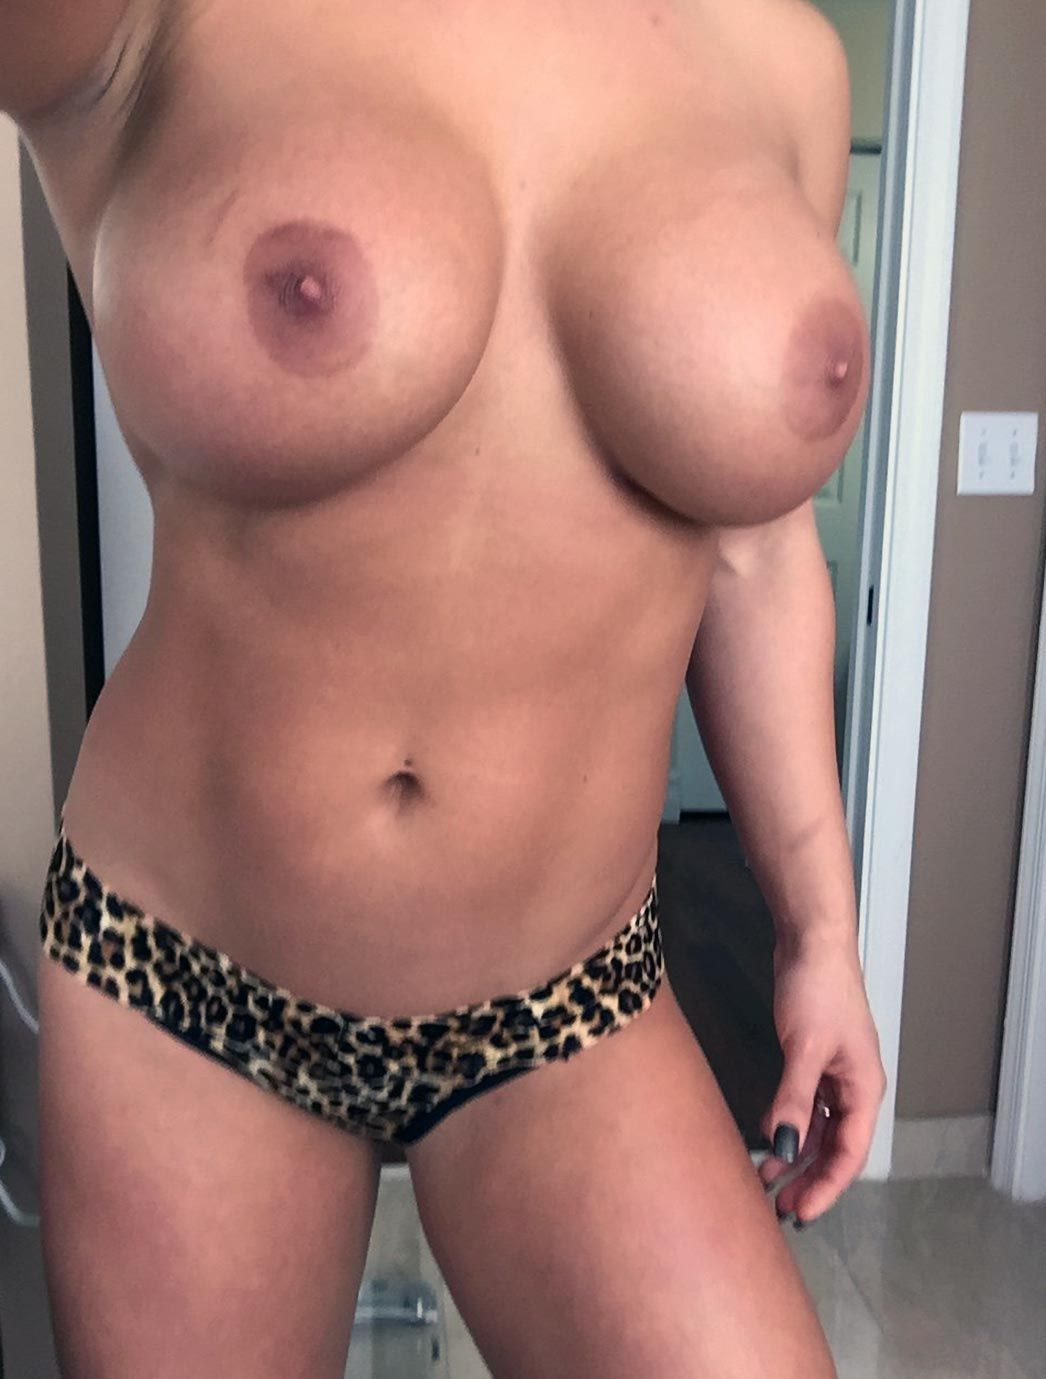 Celeste Bonin Nude Leaked The Fappening & Sexy 0150